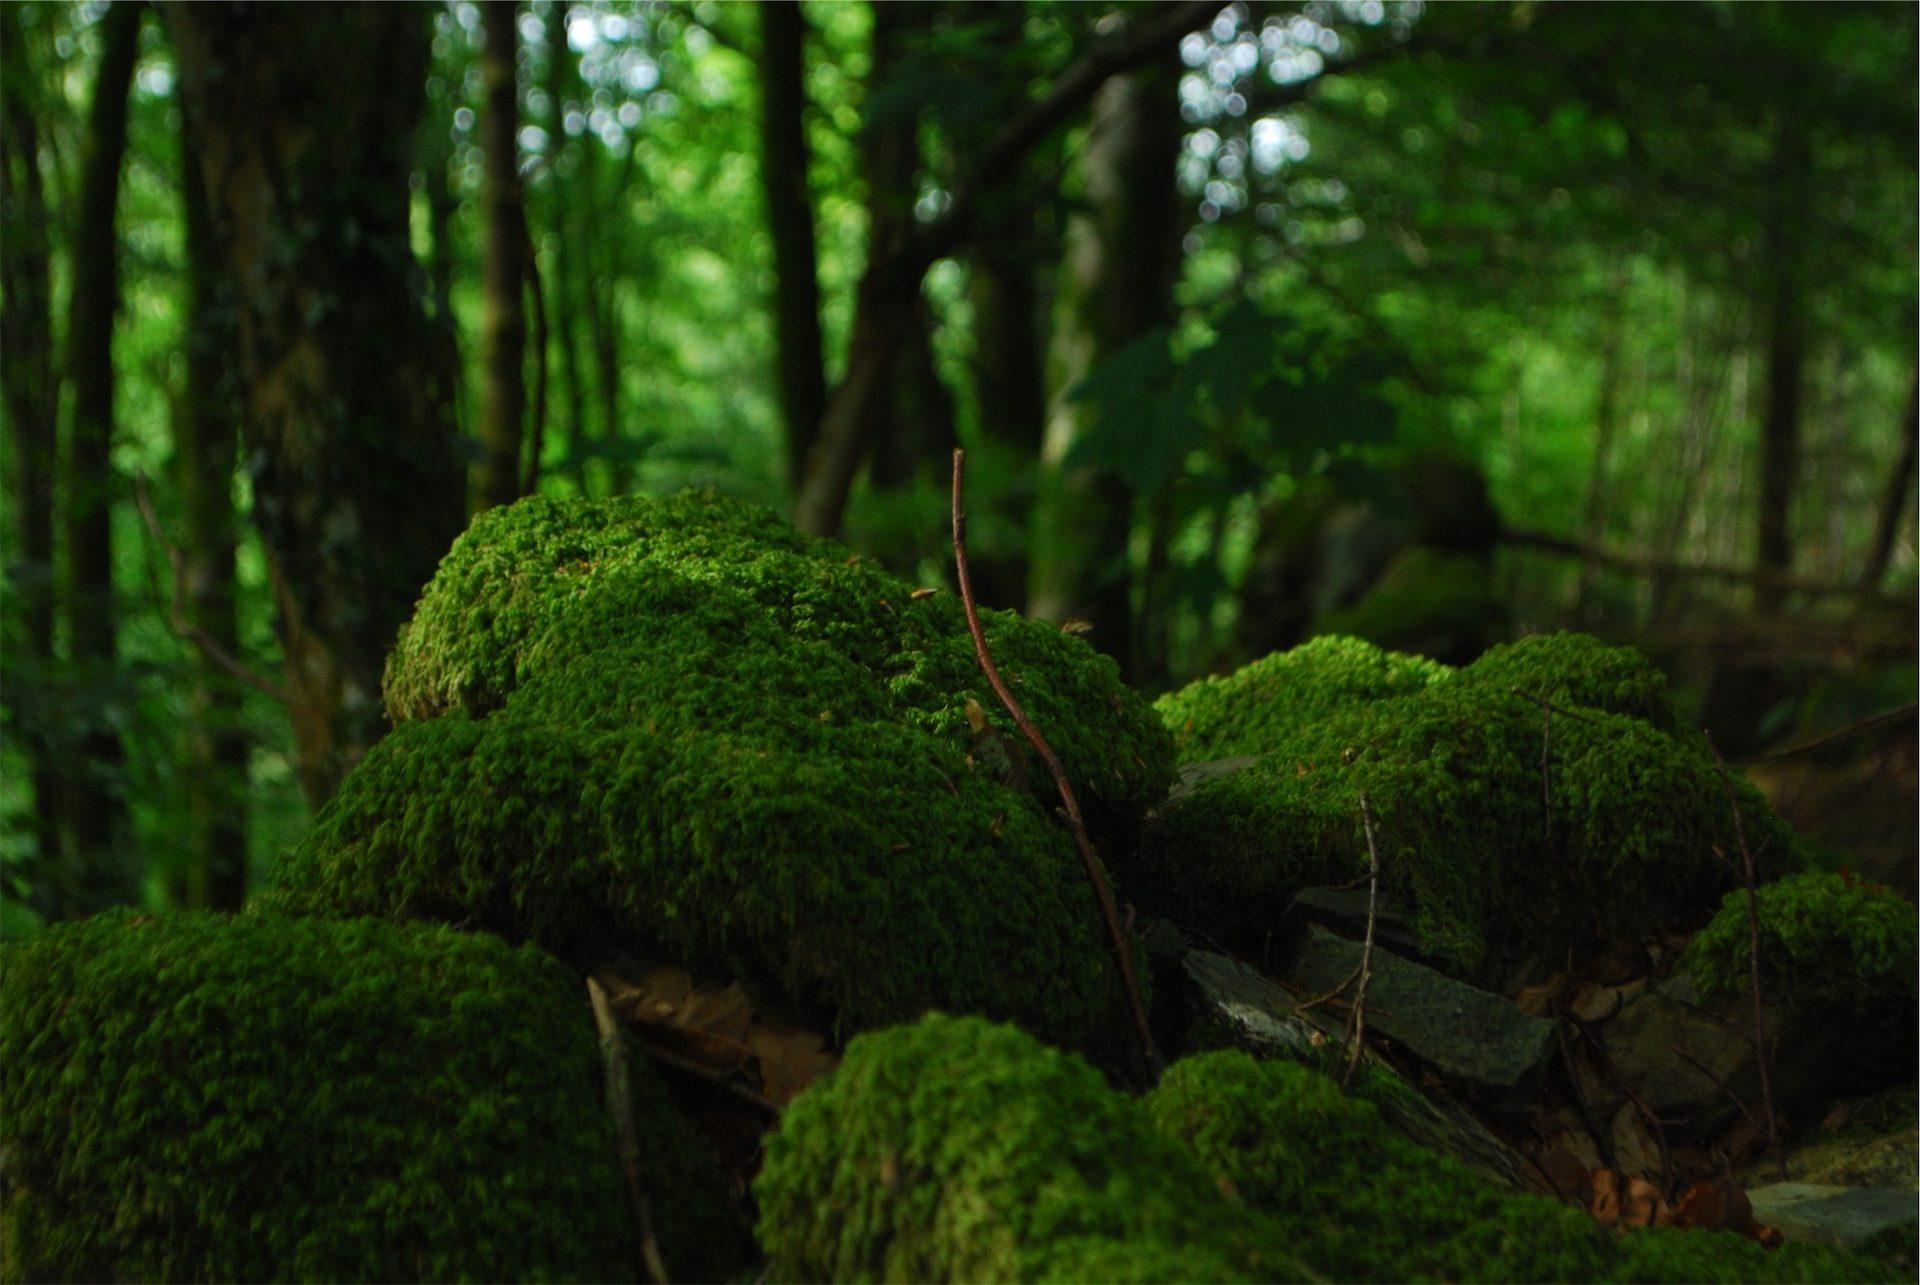 Wald, Unkraut, MOOS, Flora, Grün - Wallpaper HD - Prof.-falken.com